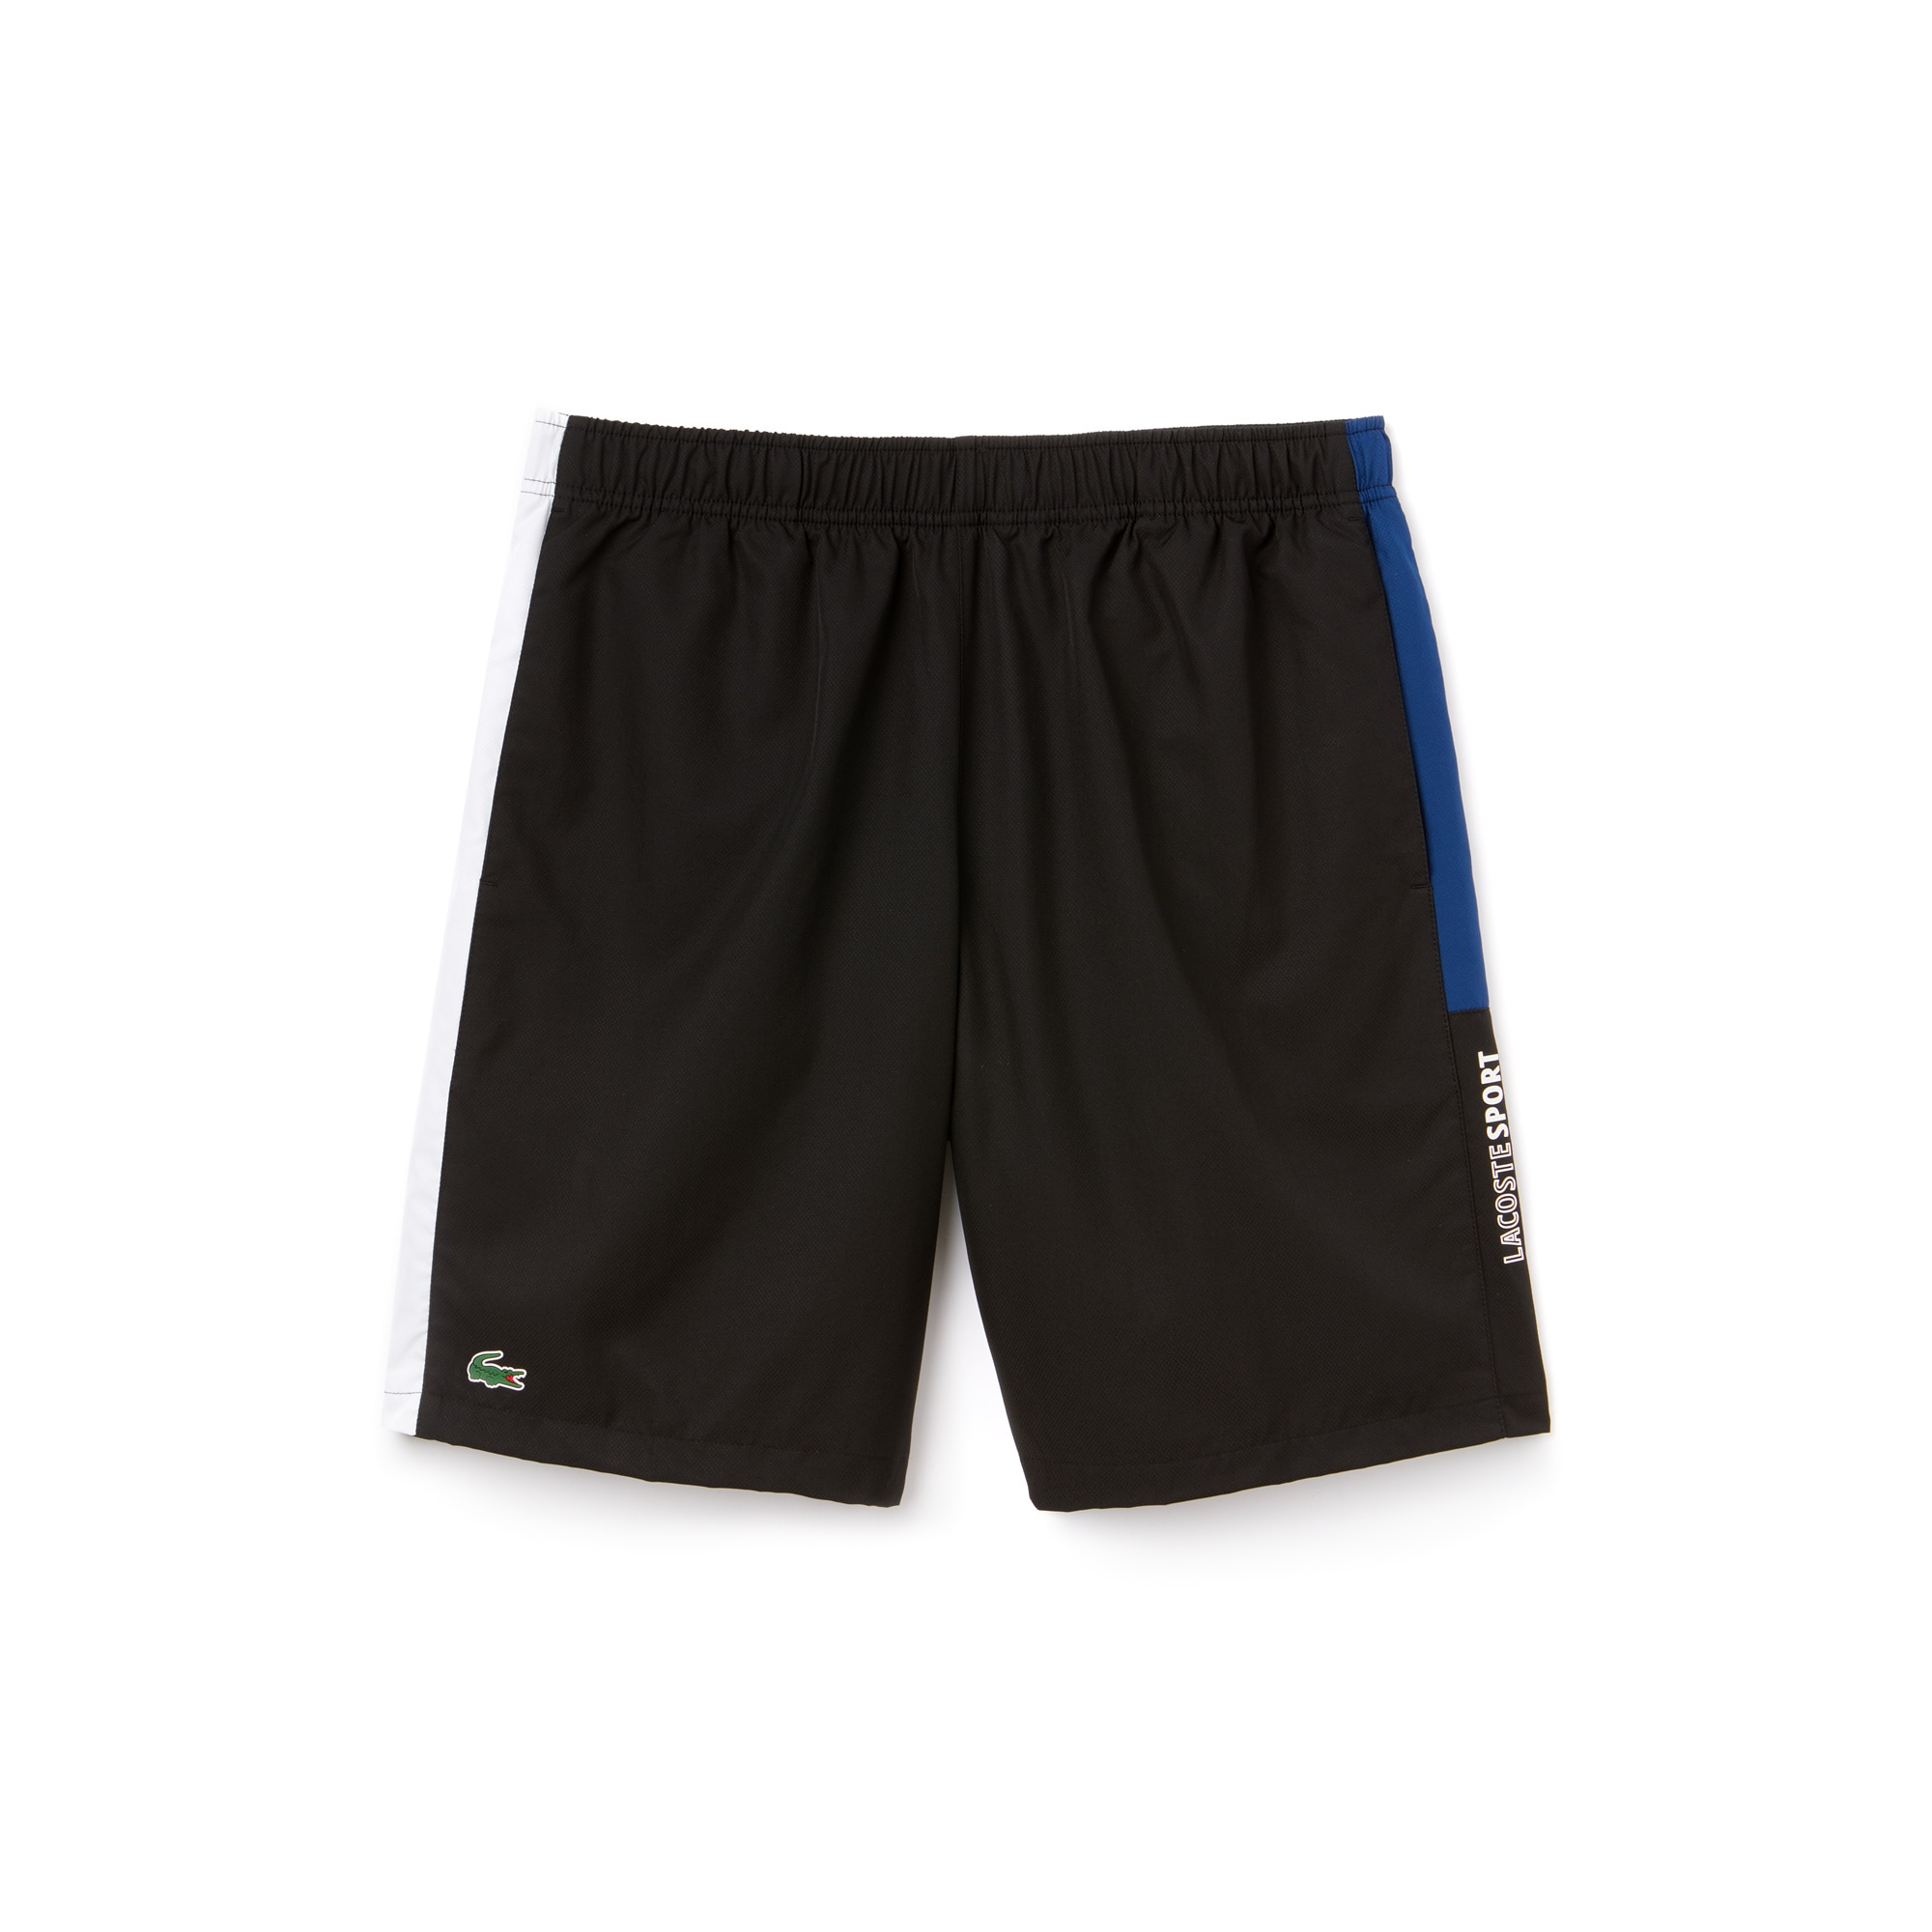 Pantalón Corto De Hombre Lacoste SPORT Tennis En Tafetán Con Franjas De Colores